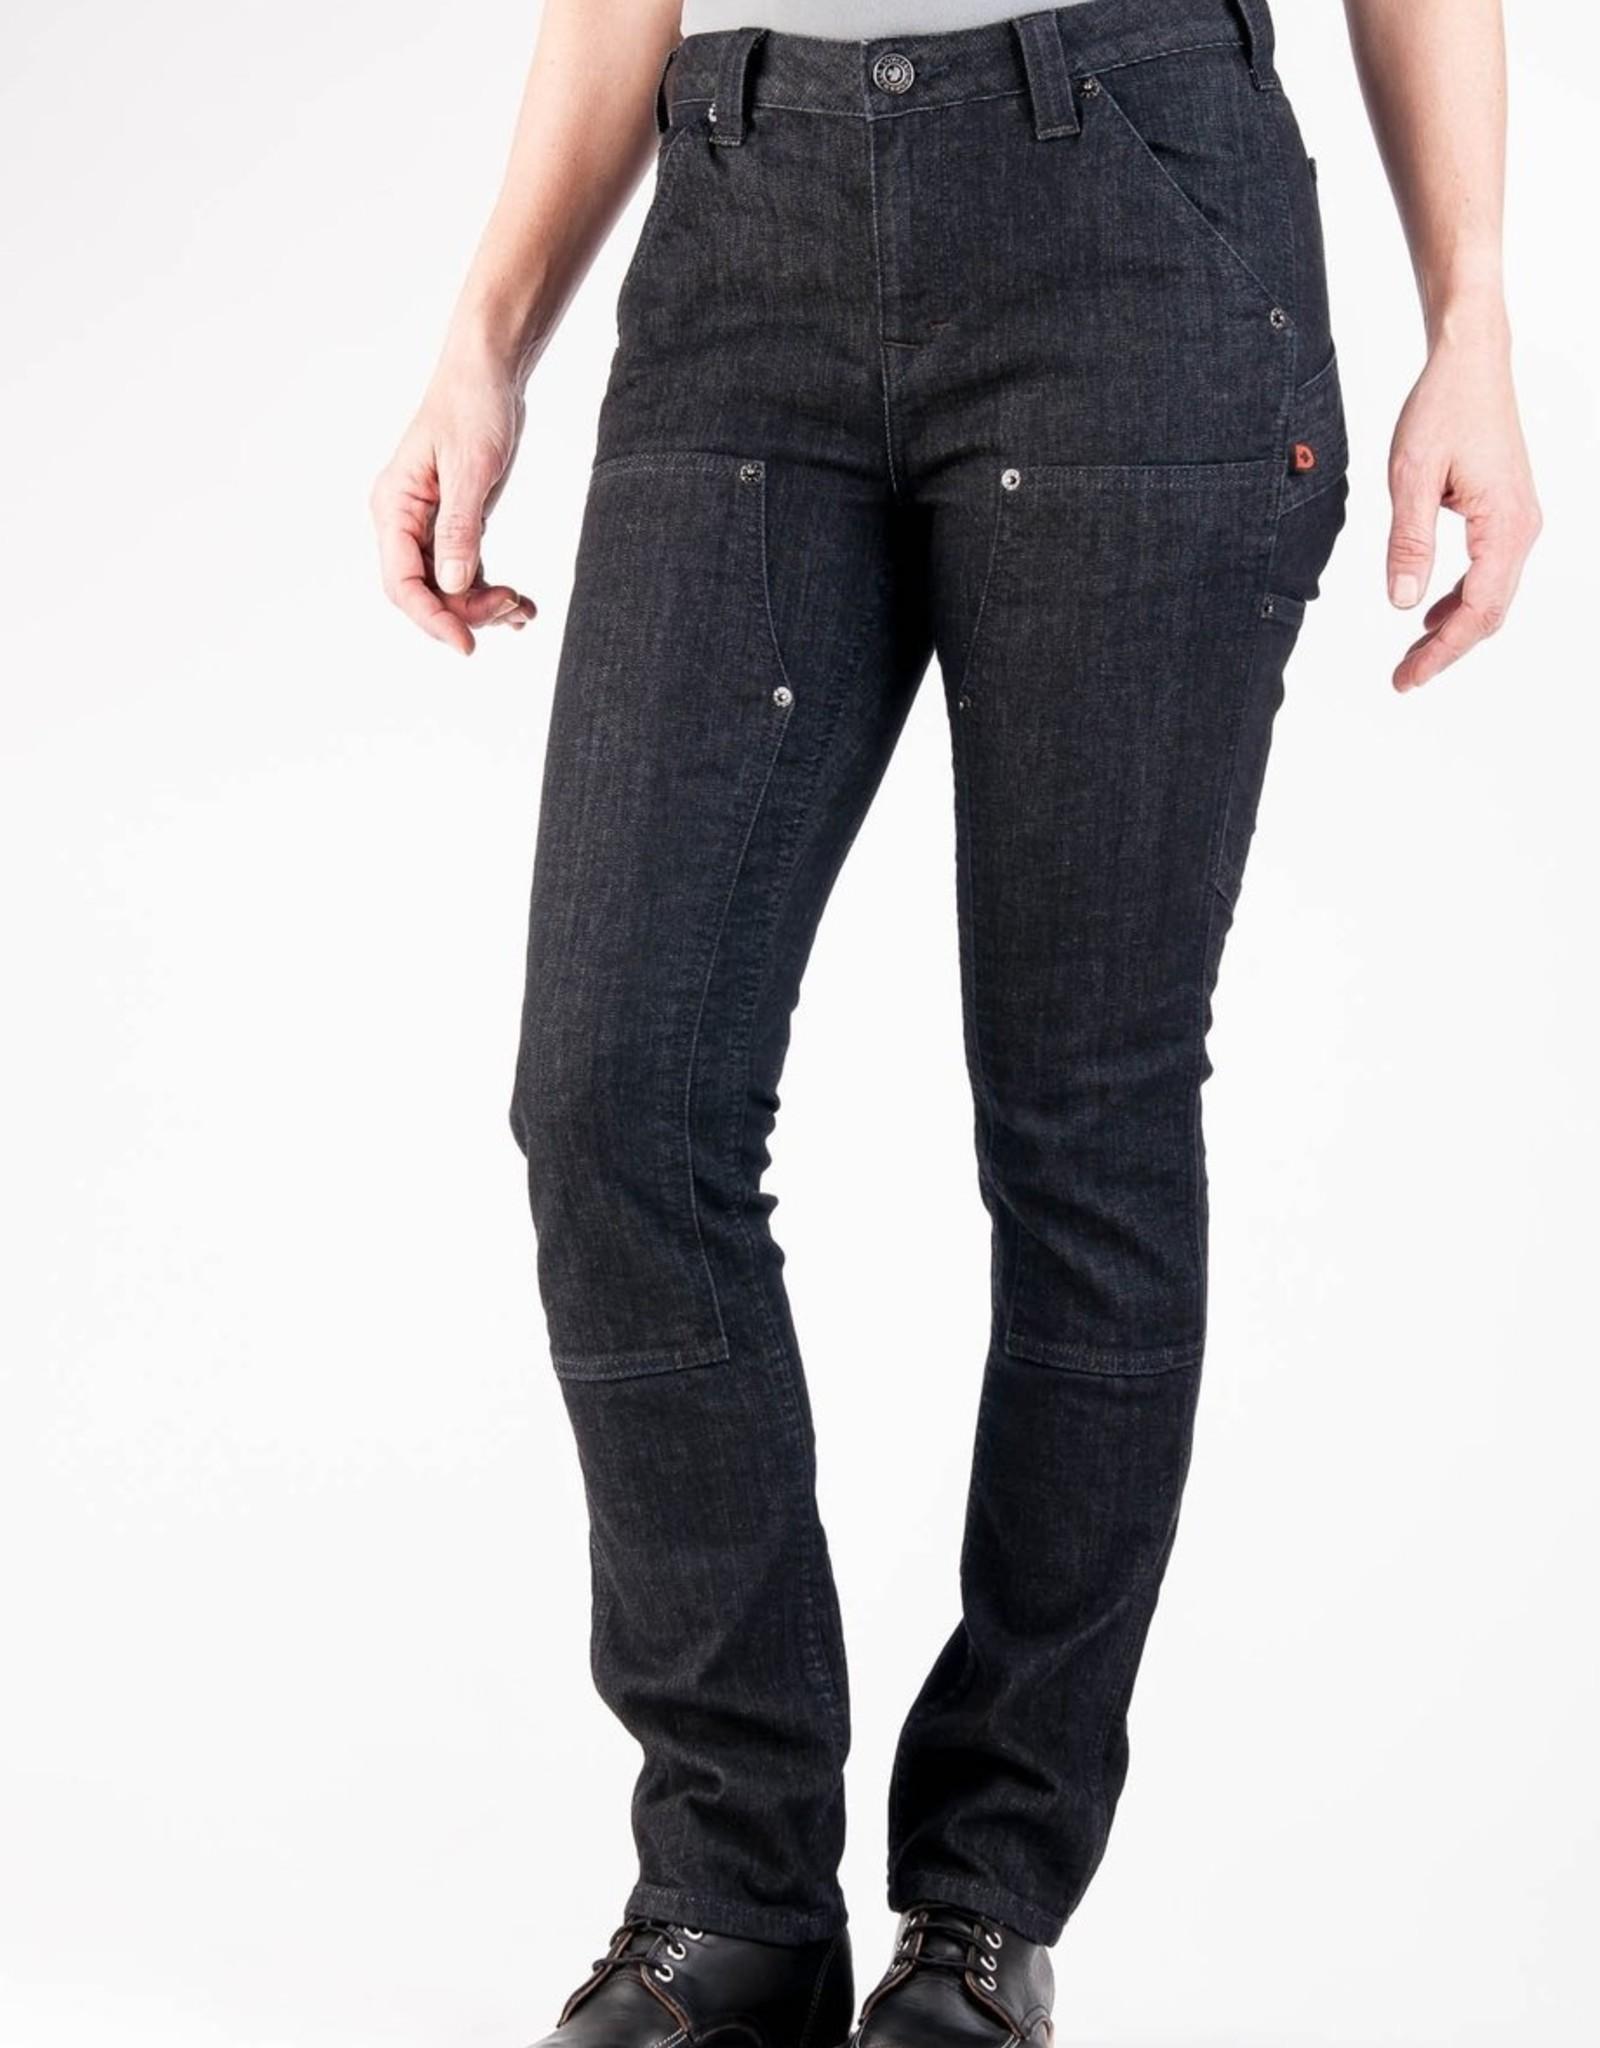 DOVETAIL Dovetail Womens Workwear Maven Pant - Black